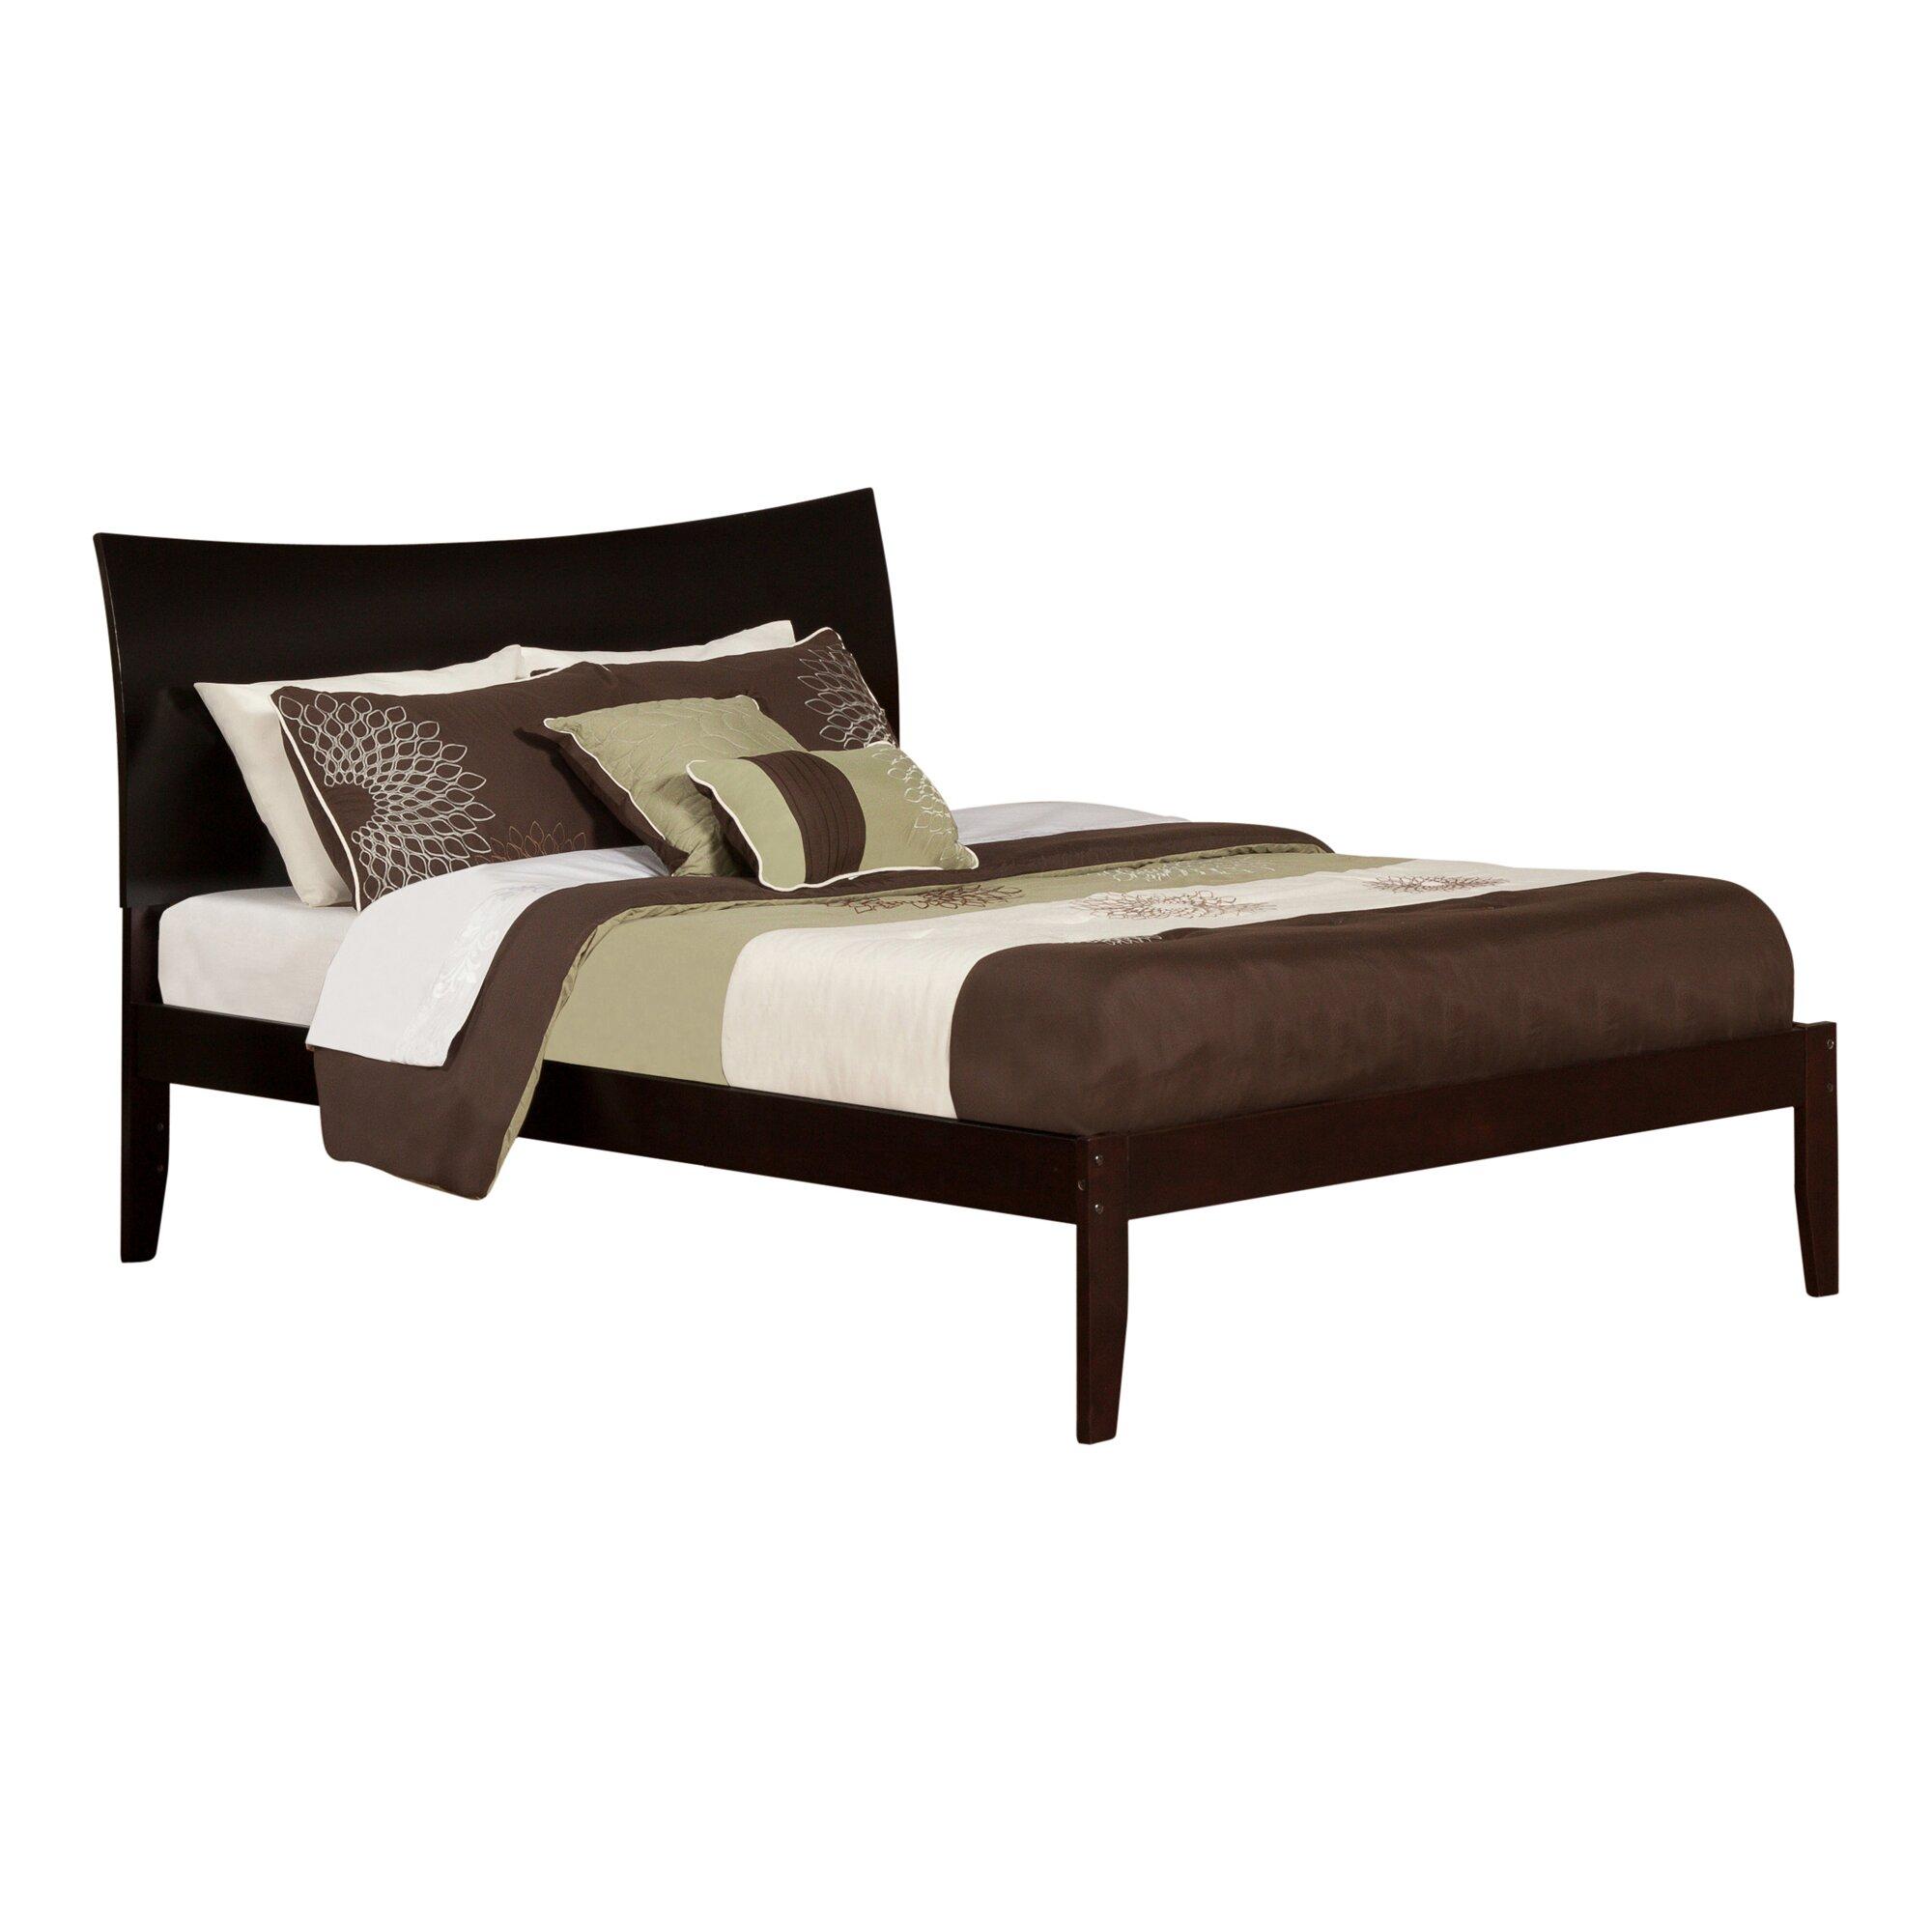 Atlantic furniture soho king platform bed wayfair for Wayfair shop furniture